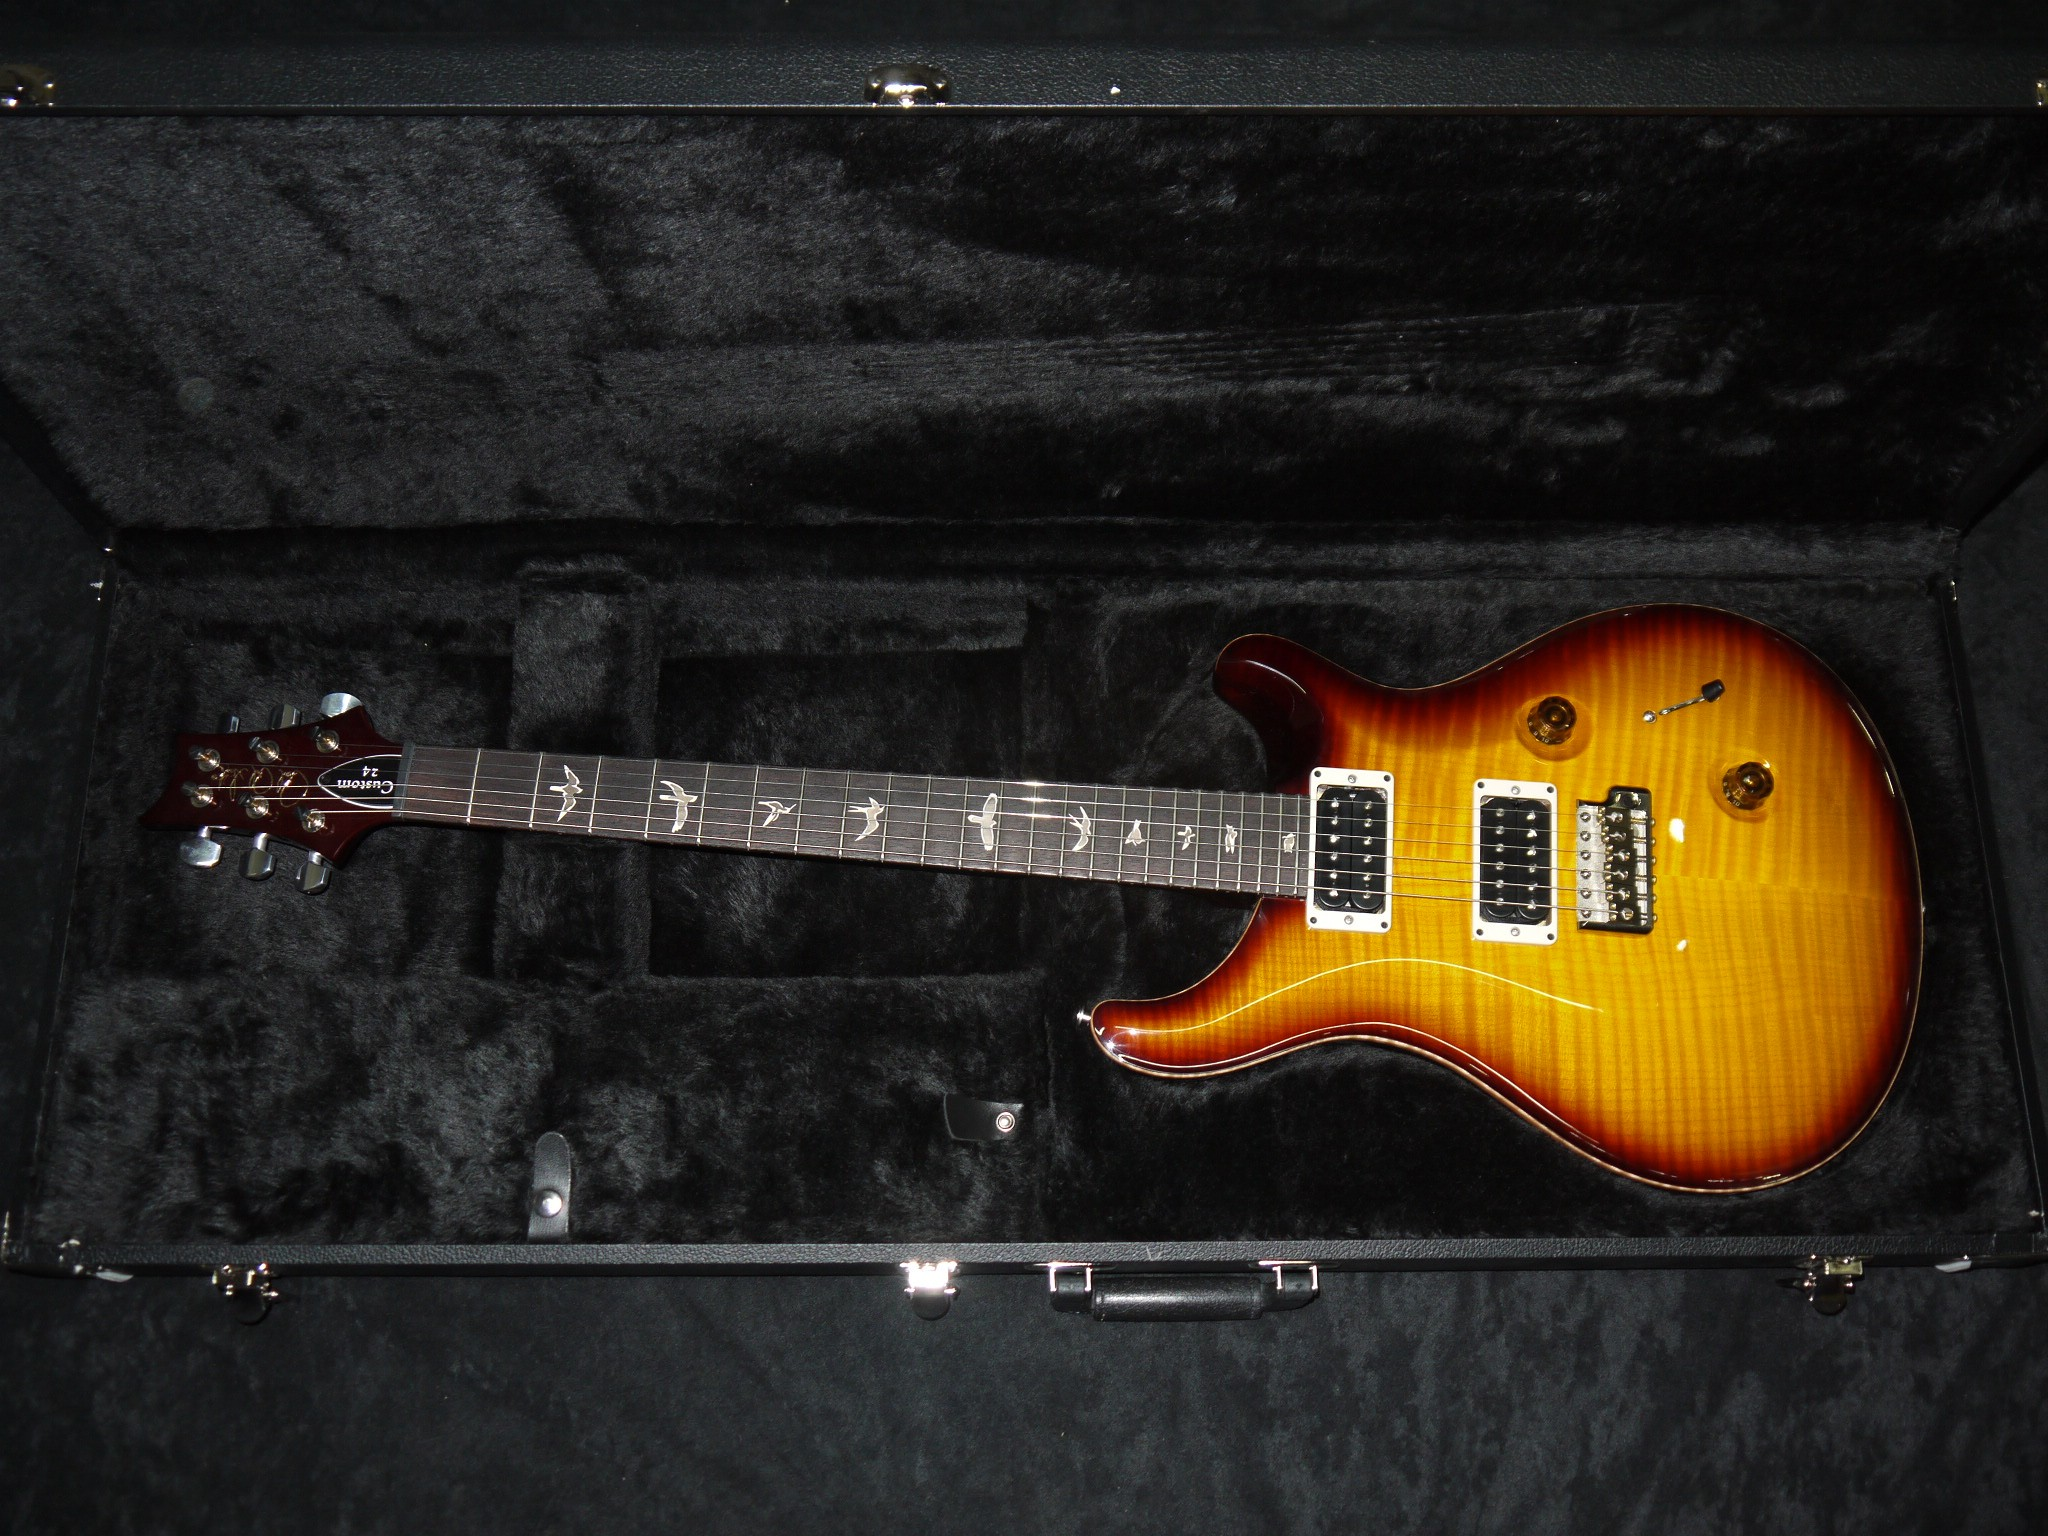 PRS Paul Reed Smith Custom 24 McCarty 2010s Tobacco Sunburst Guitar 2048x1536